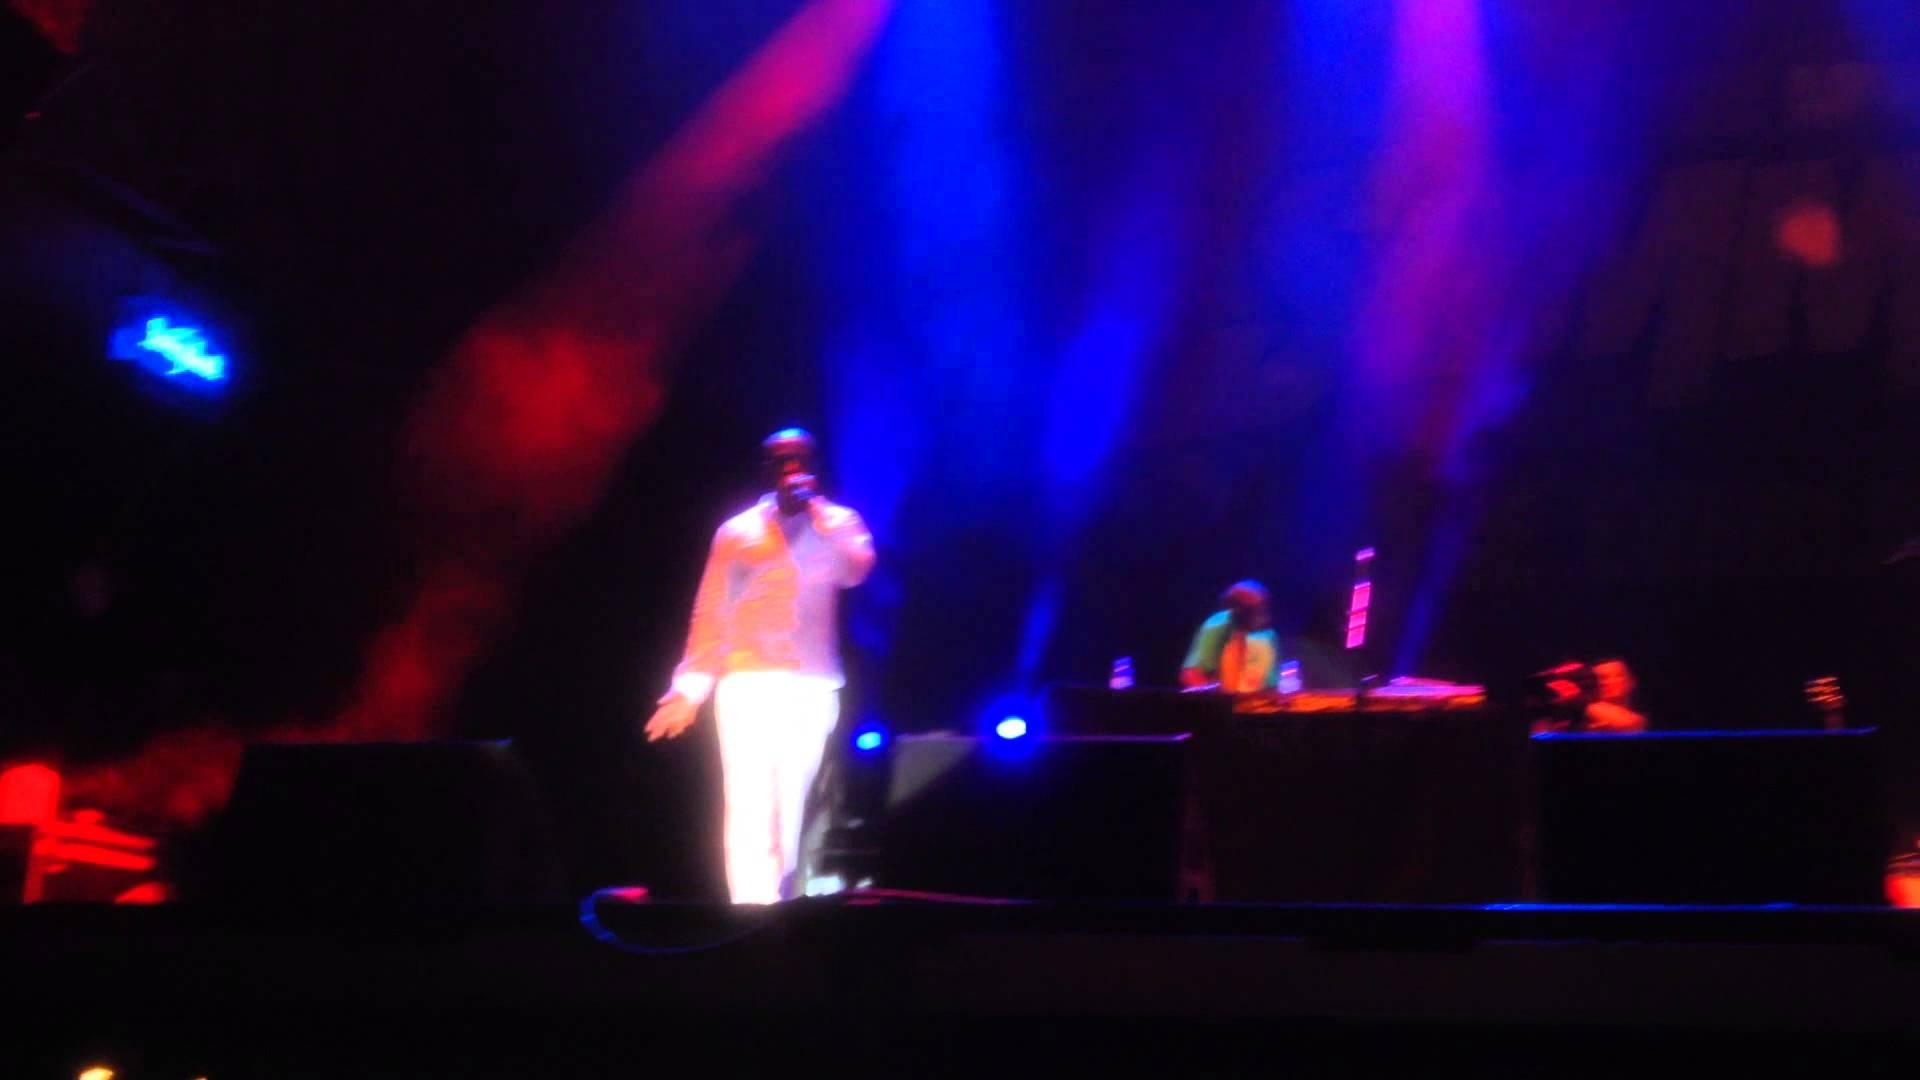 Wyclef Jeans Plays Dubplates @SummerJam 2015 [7/6/2015]